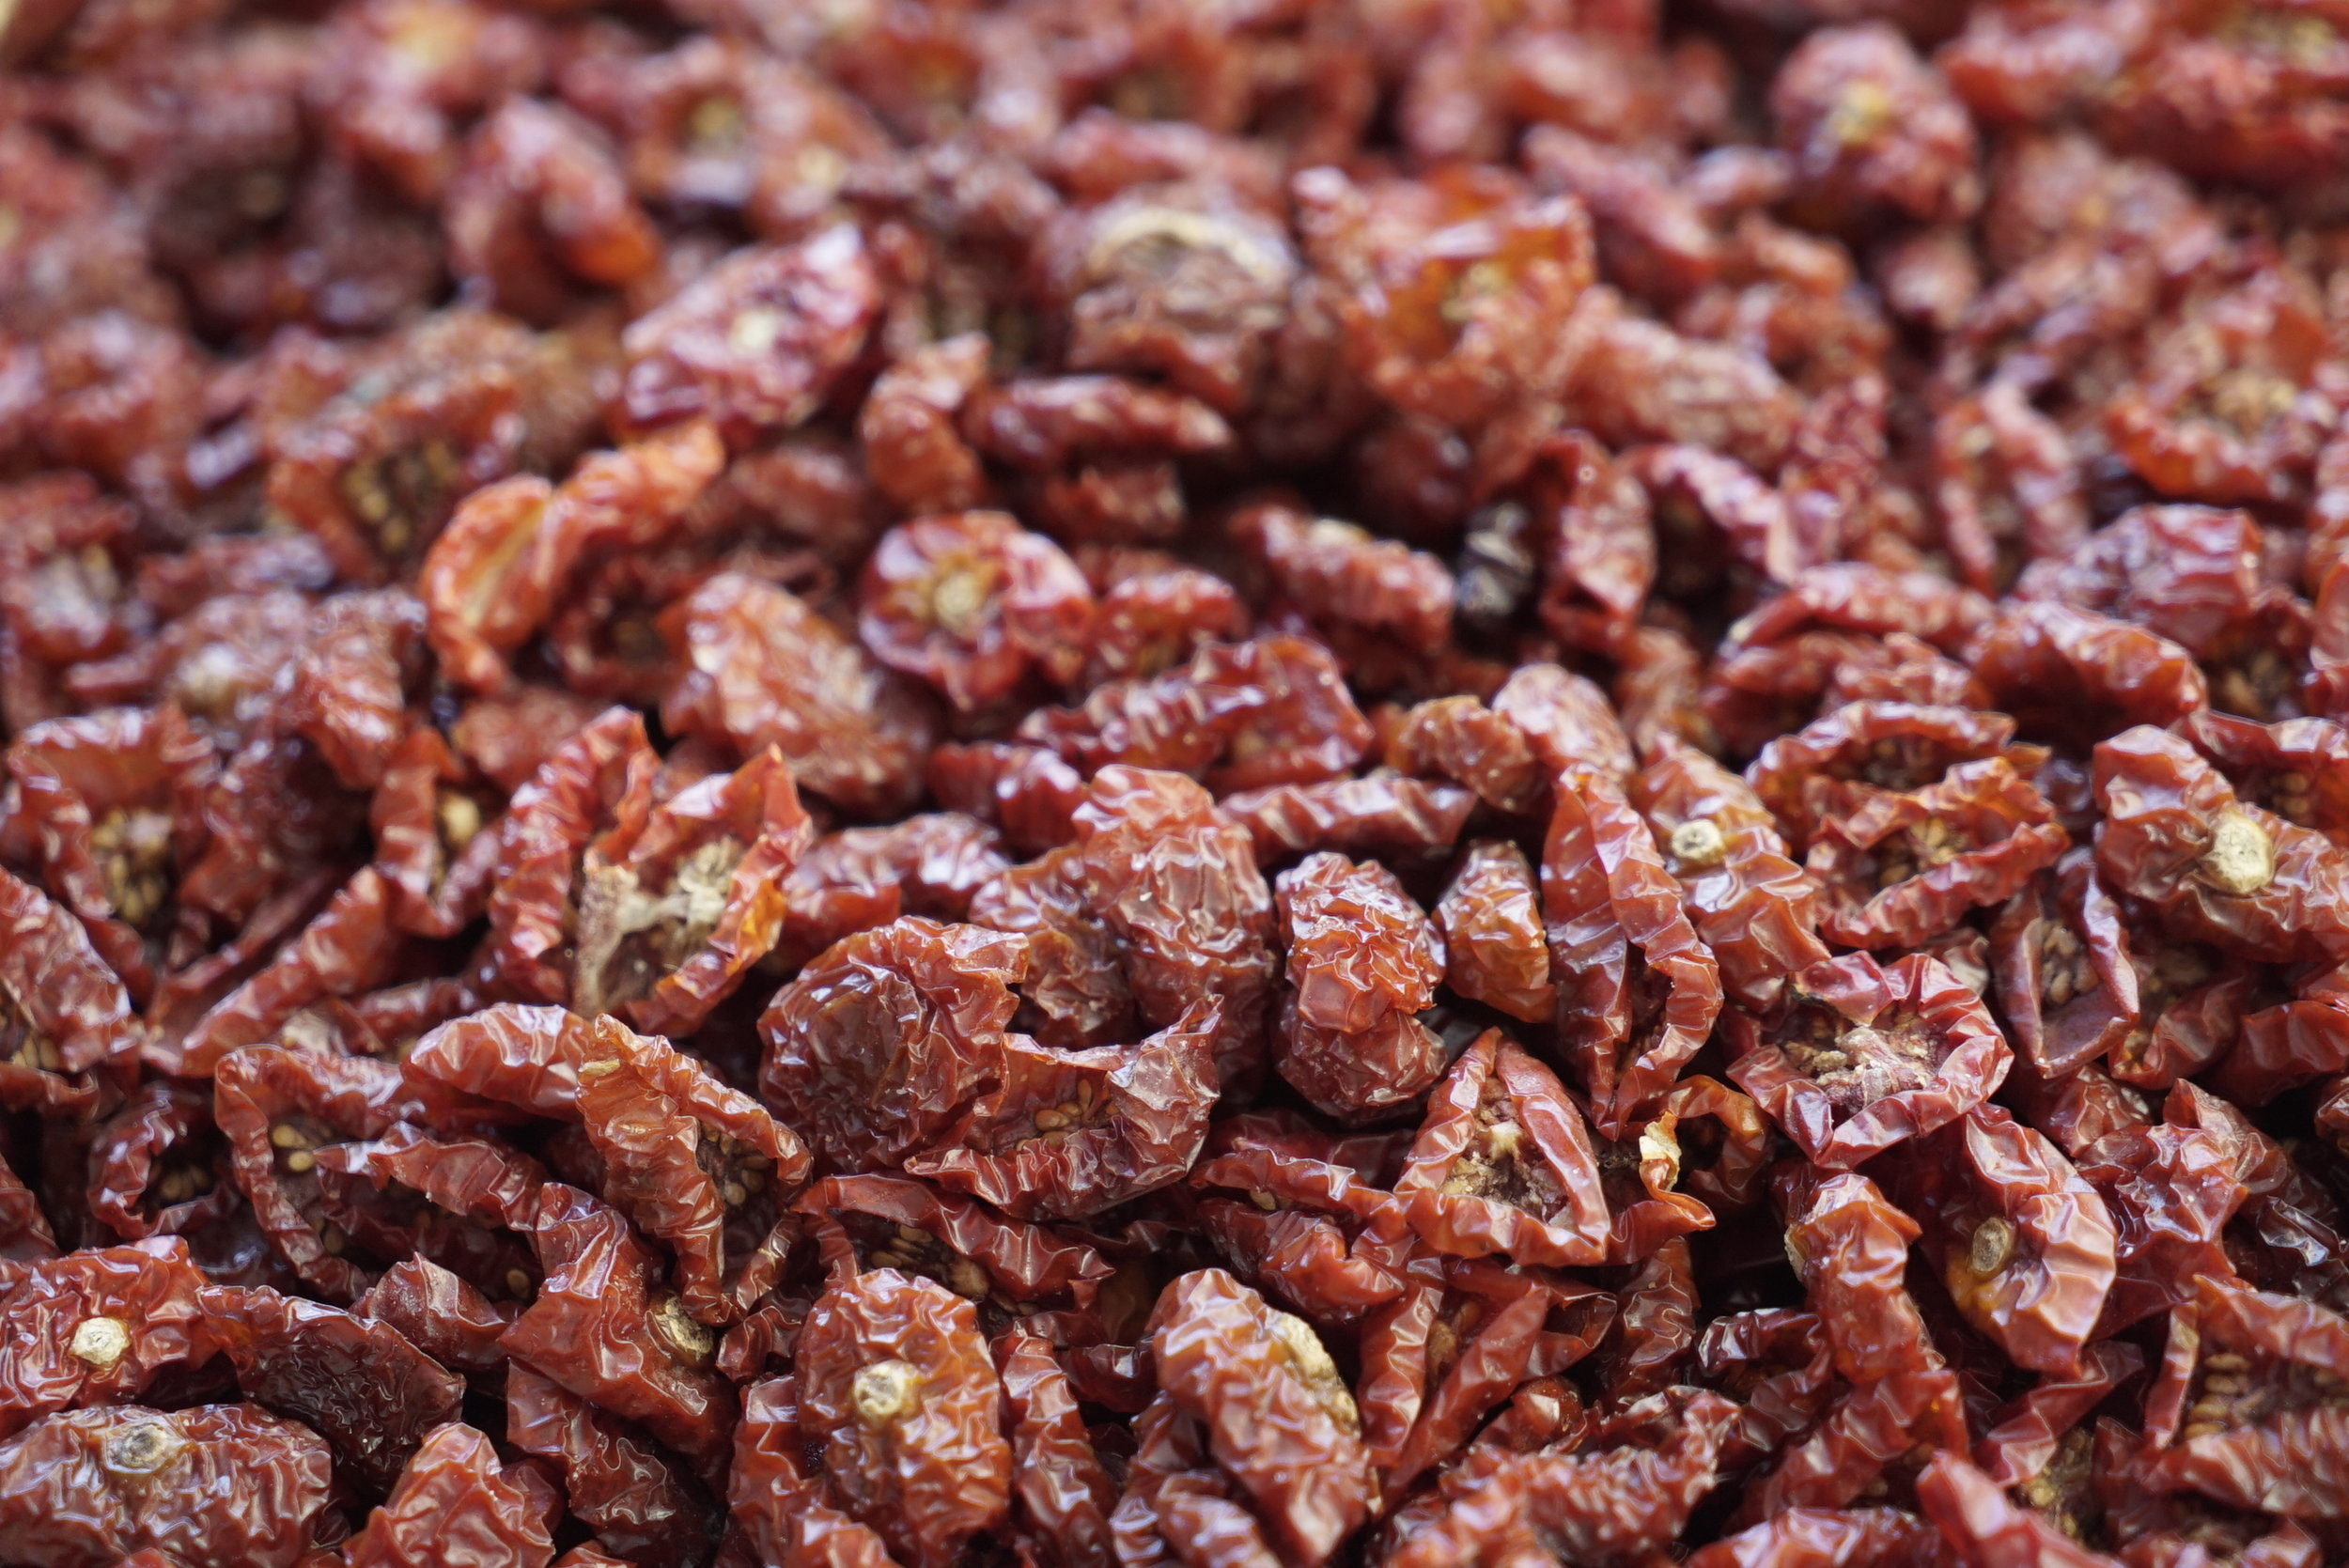 sun-dried tomatoes sicily.JPG